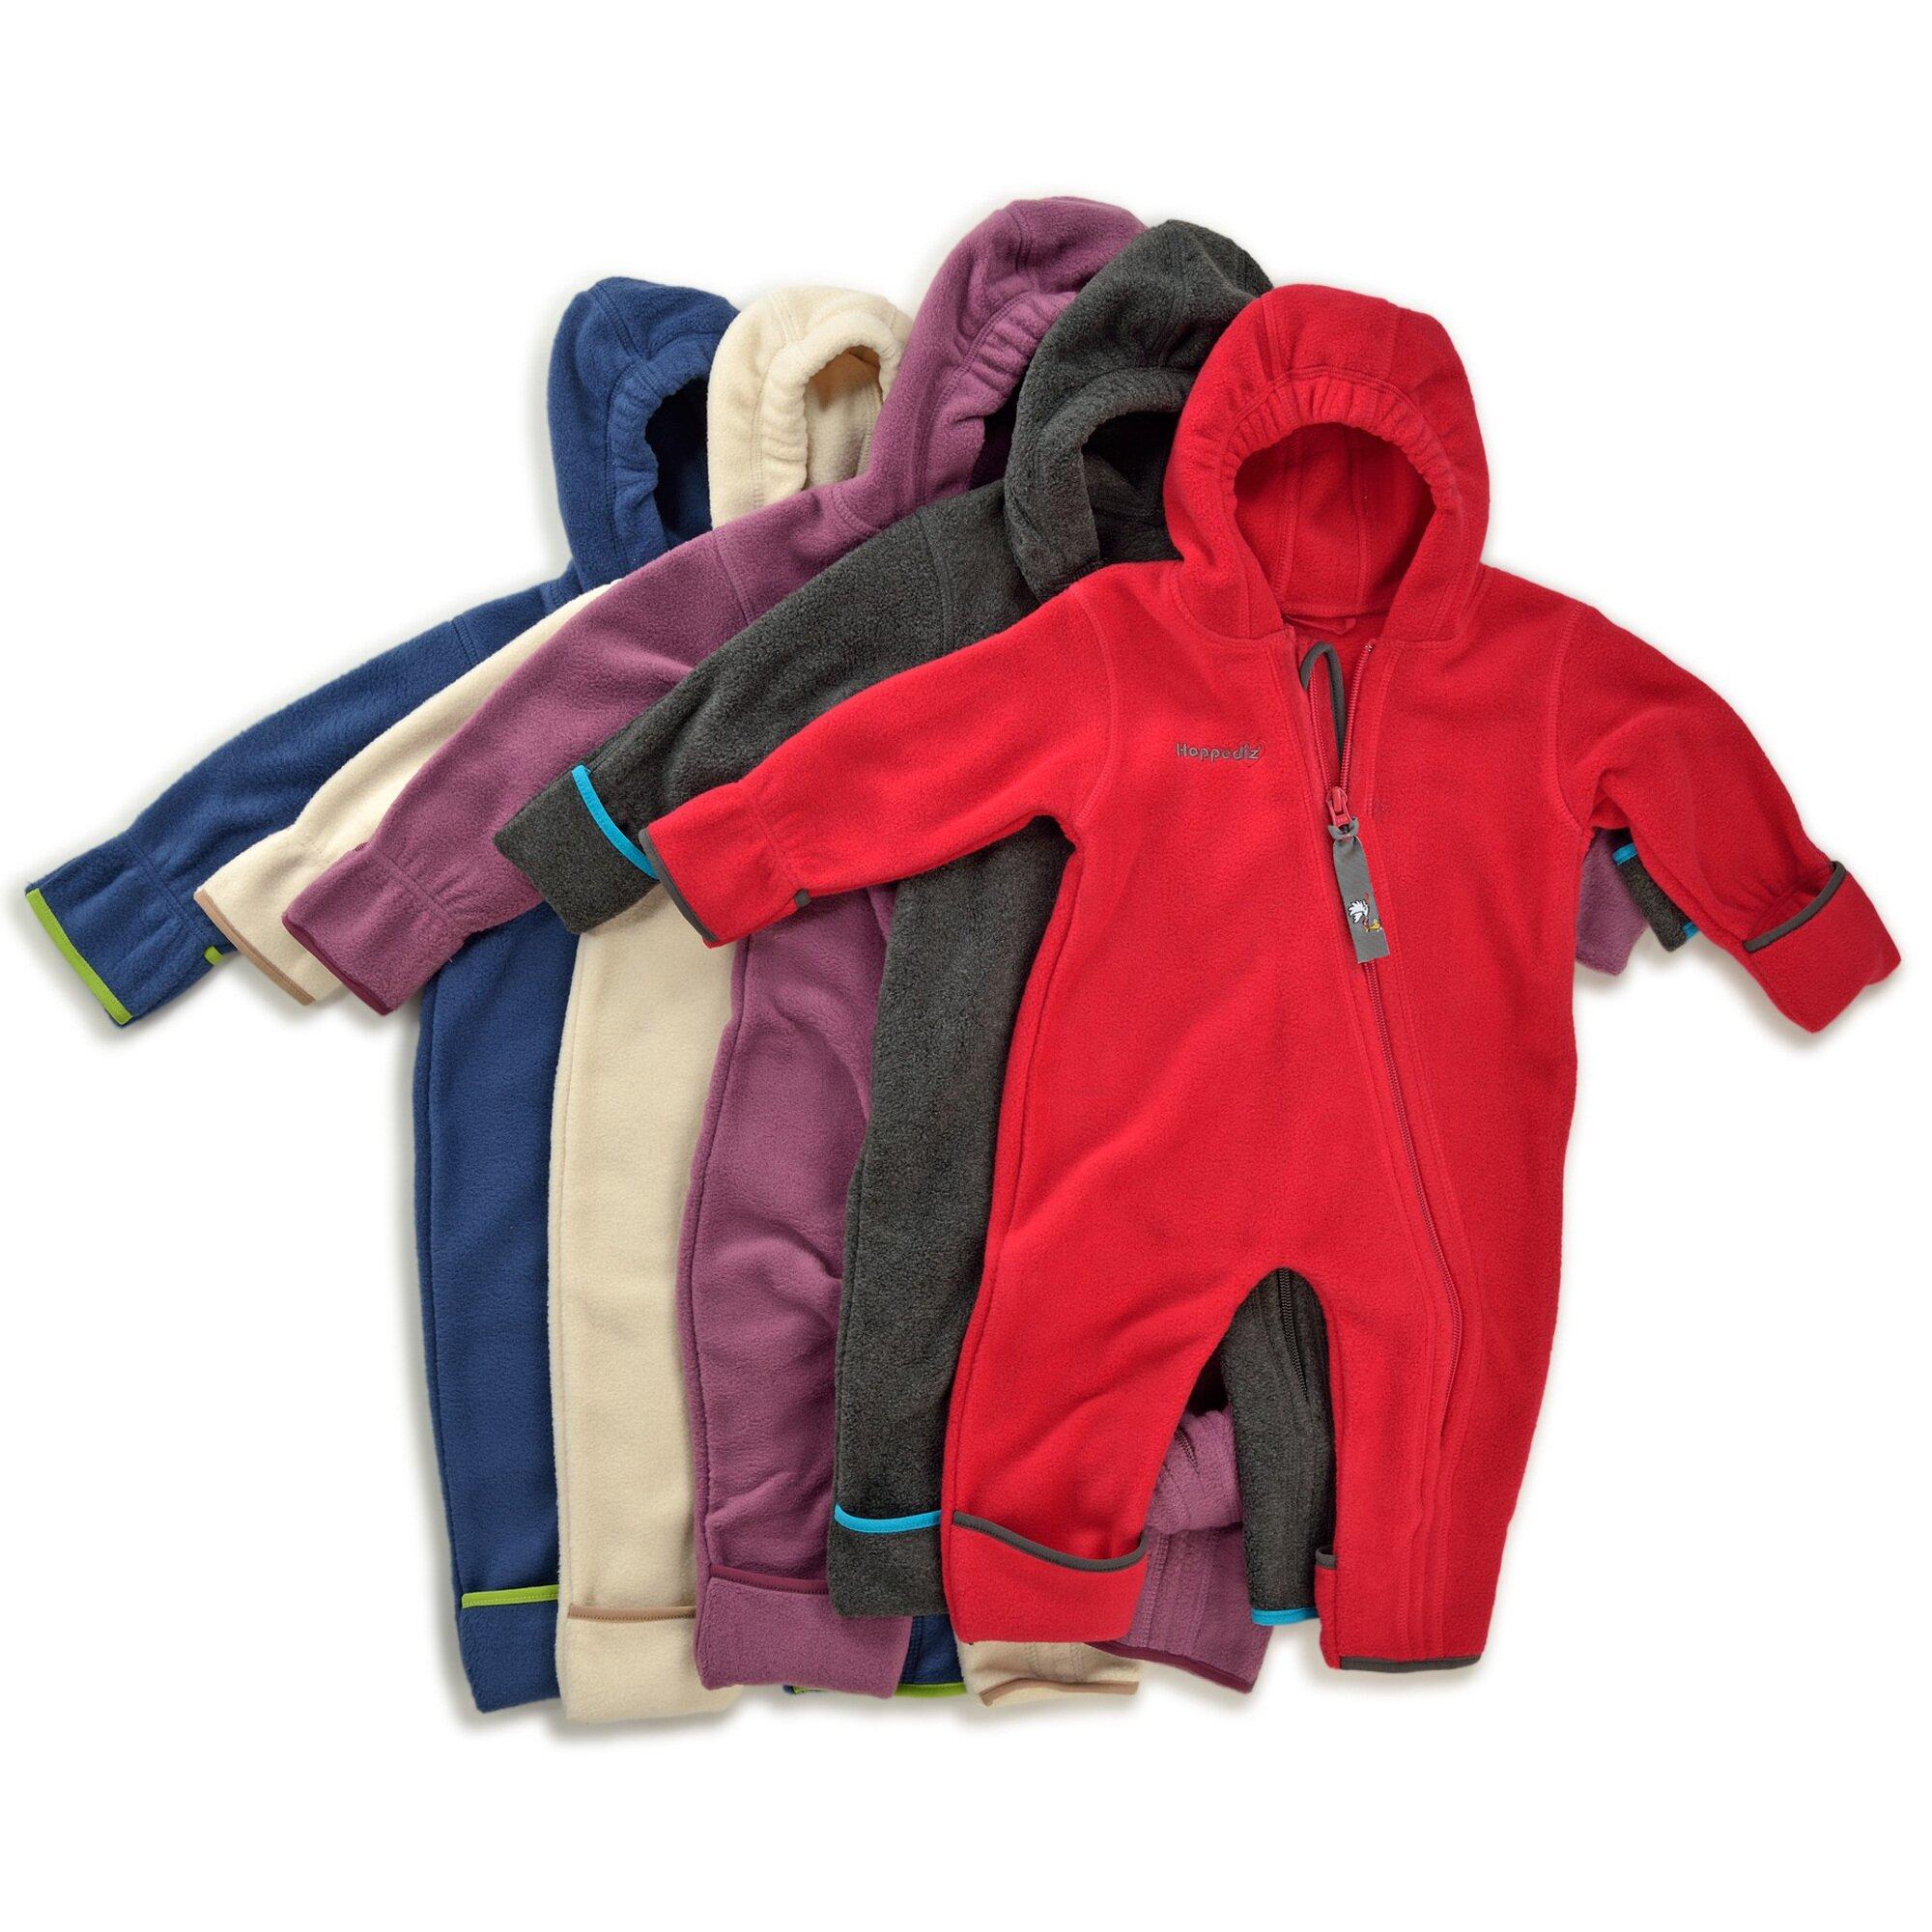 hoppediz-fleece-trage-overalls-beige